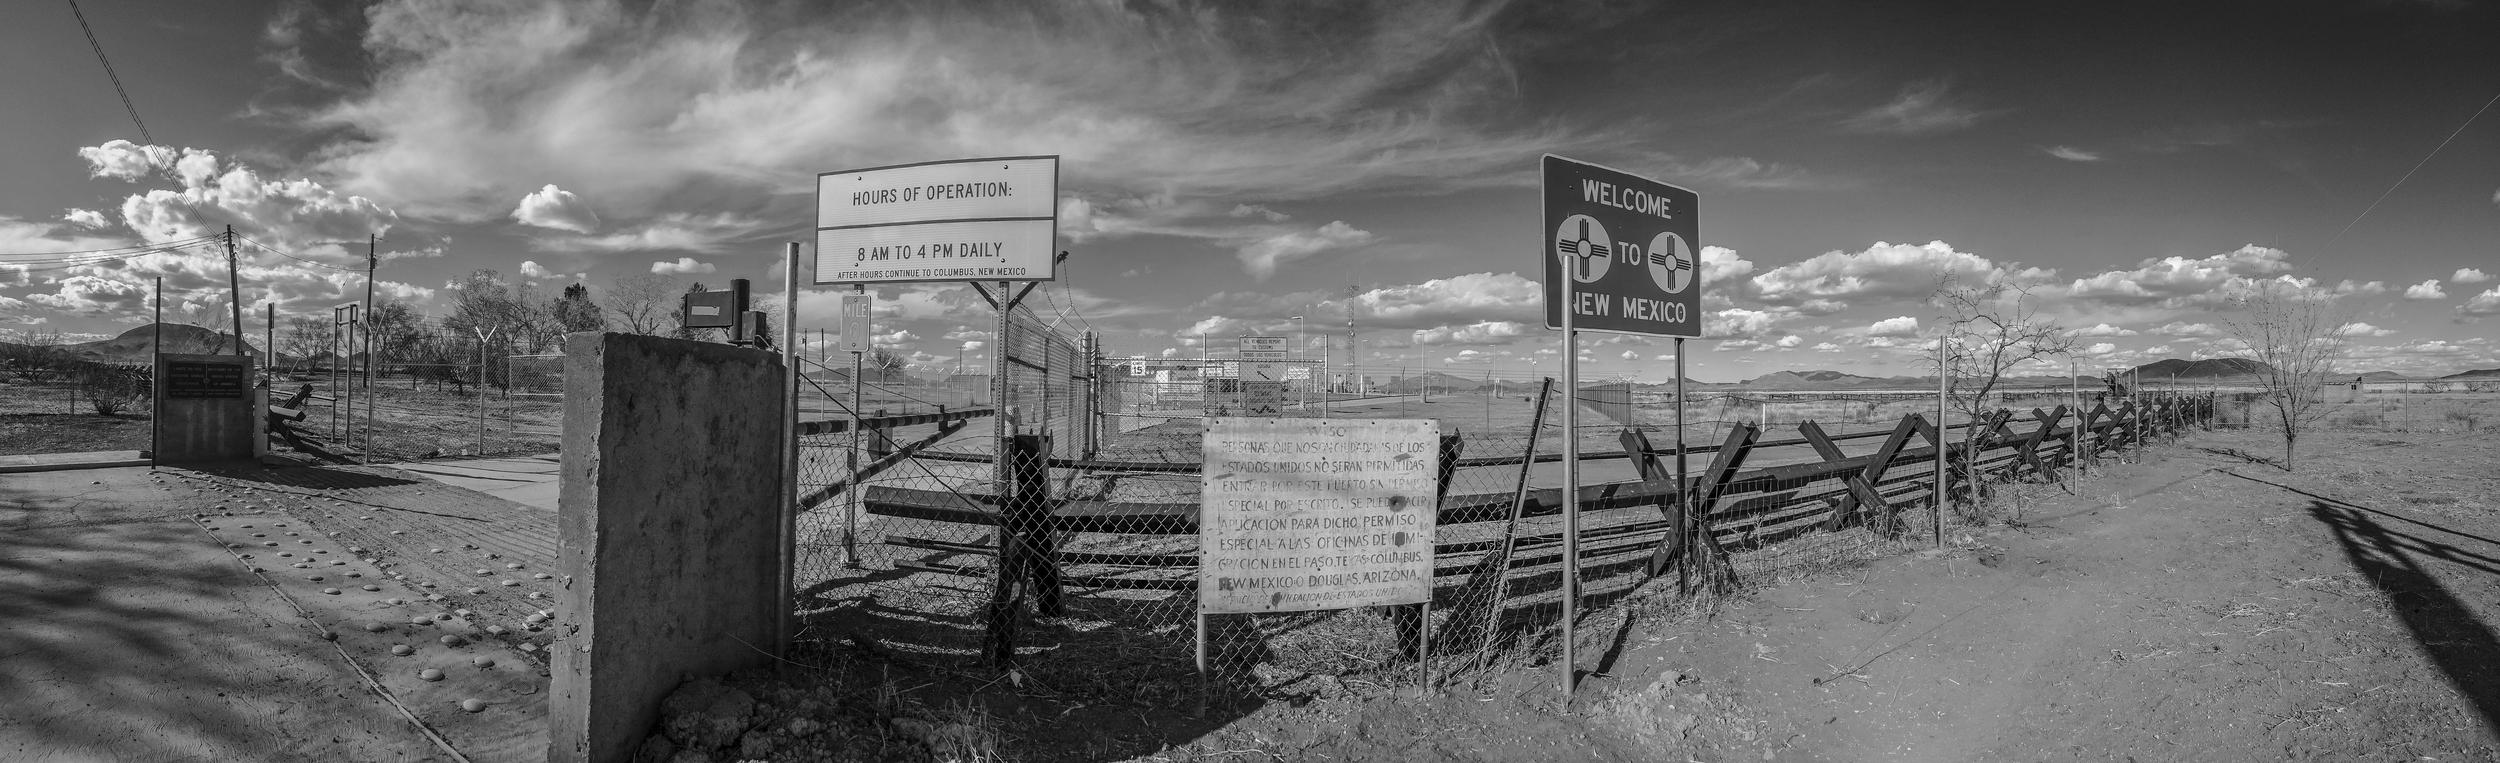 U.S. - Mexico border at Antelope Wells, New Mexico